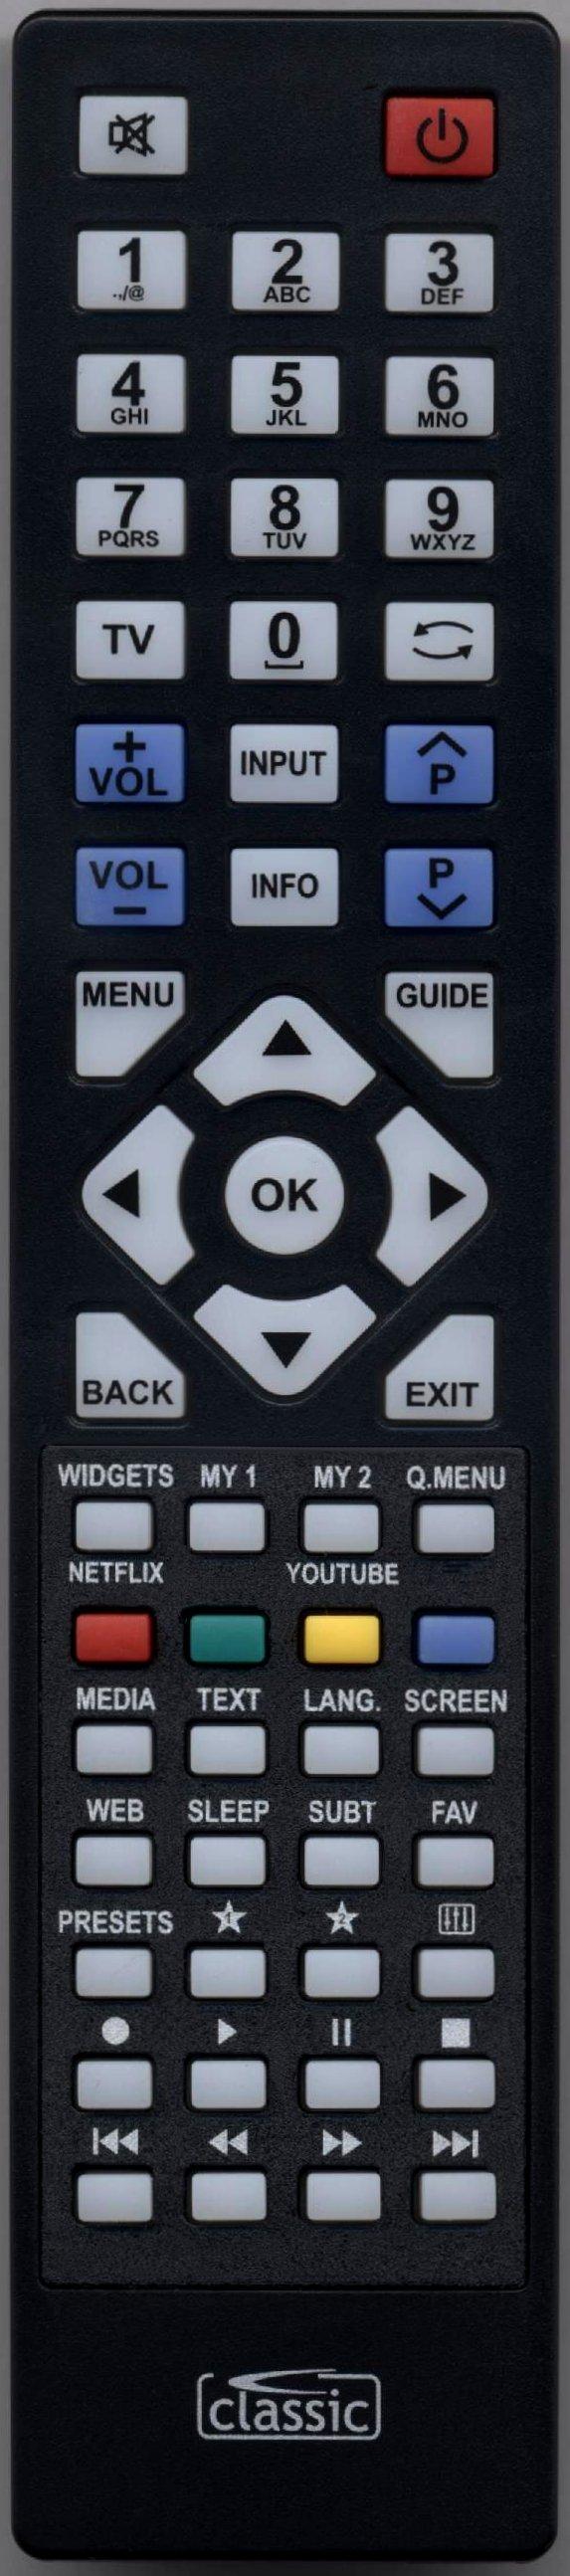 Polaroid P50LED14 Remote Control Alternative